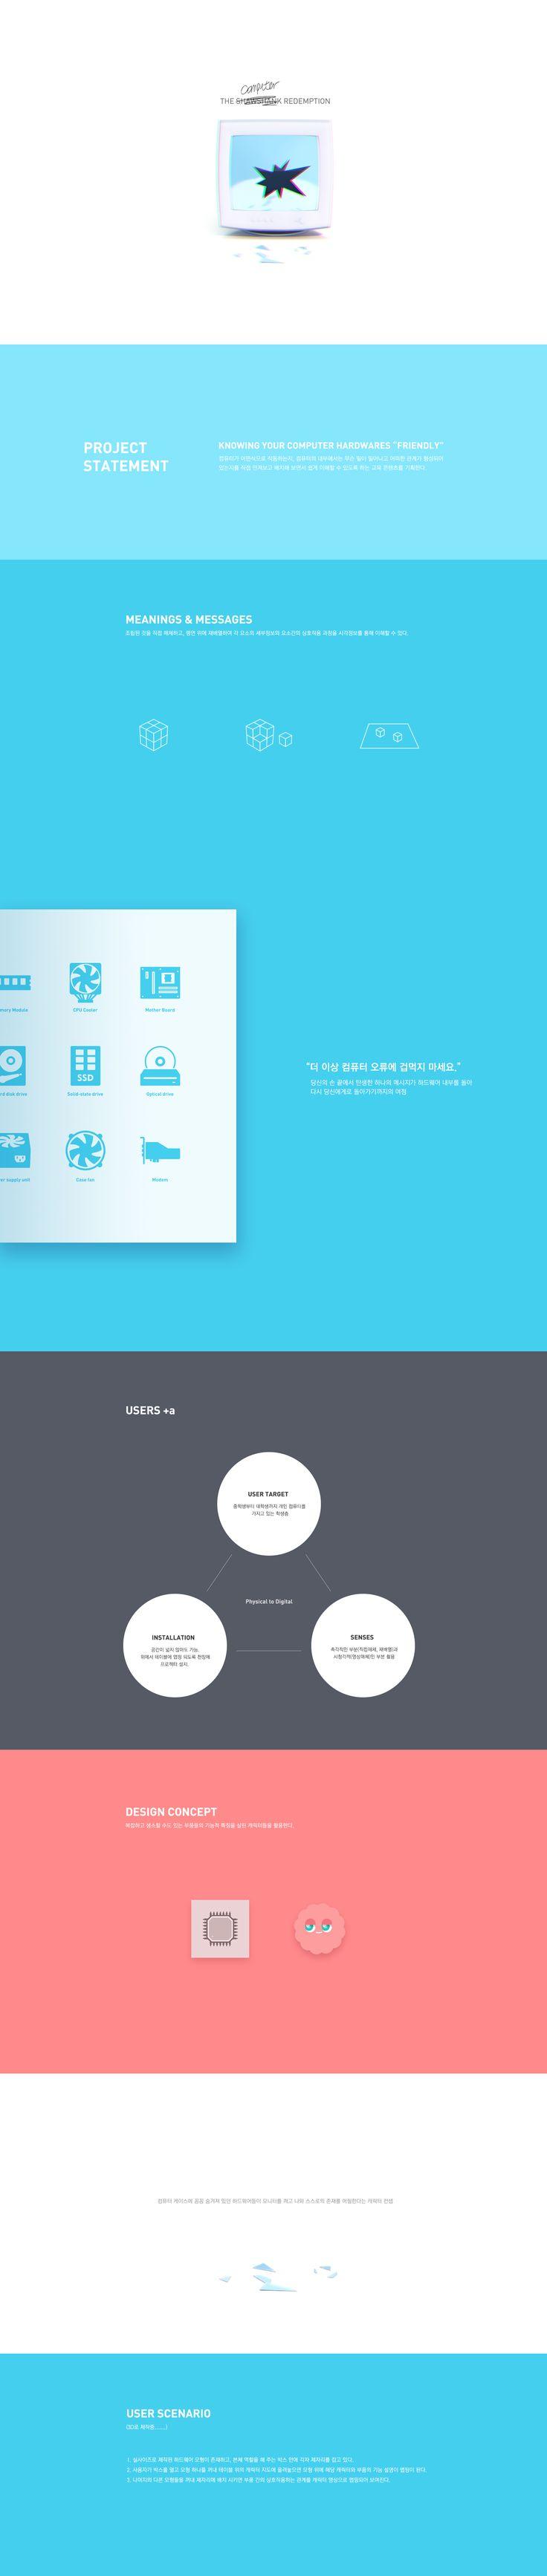 Cho Eunsaem - The Computer Redemption (behance)   Information Visualization 2016   Major in Digital Media Design   #hicoda   hicoda.hongik.ac.kr